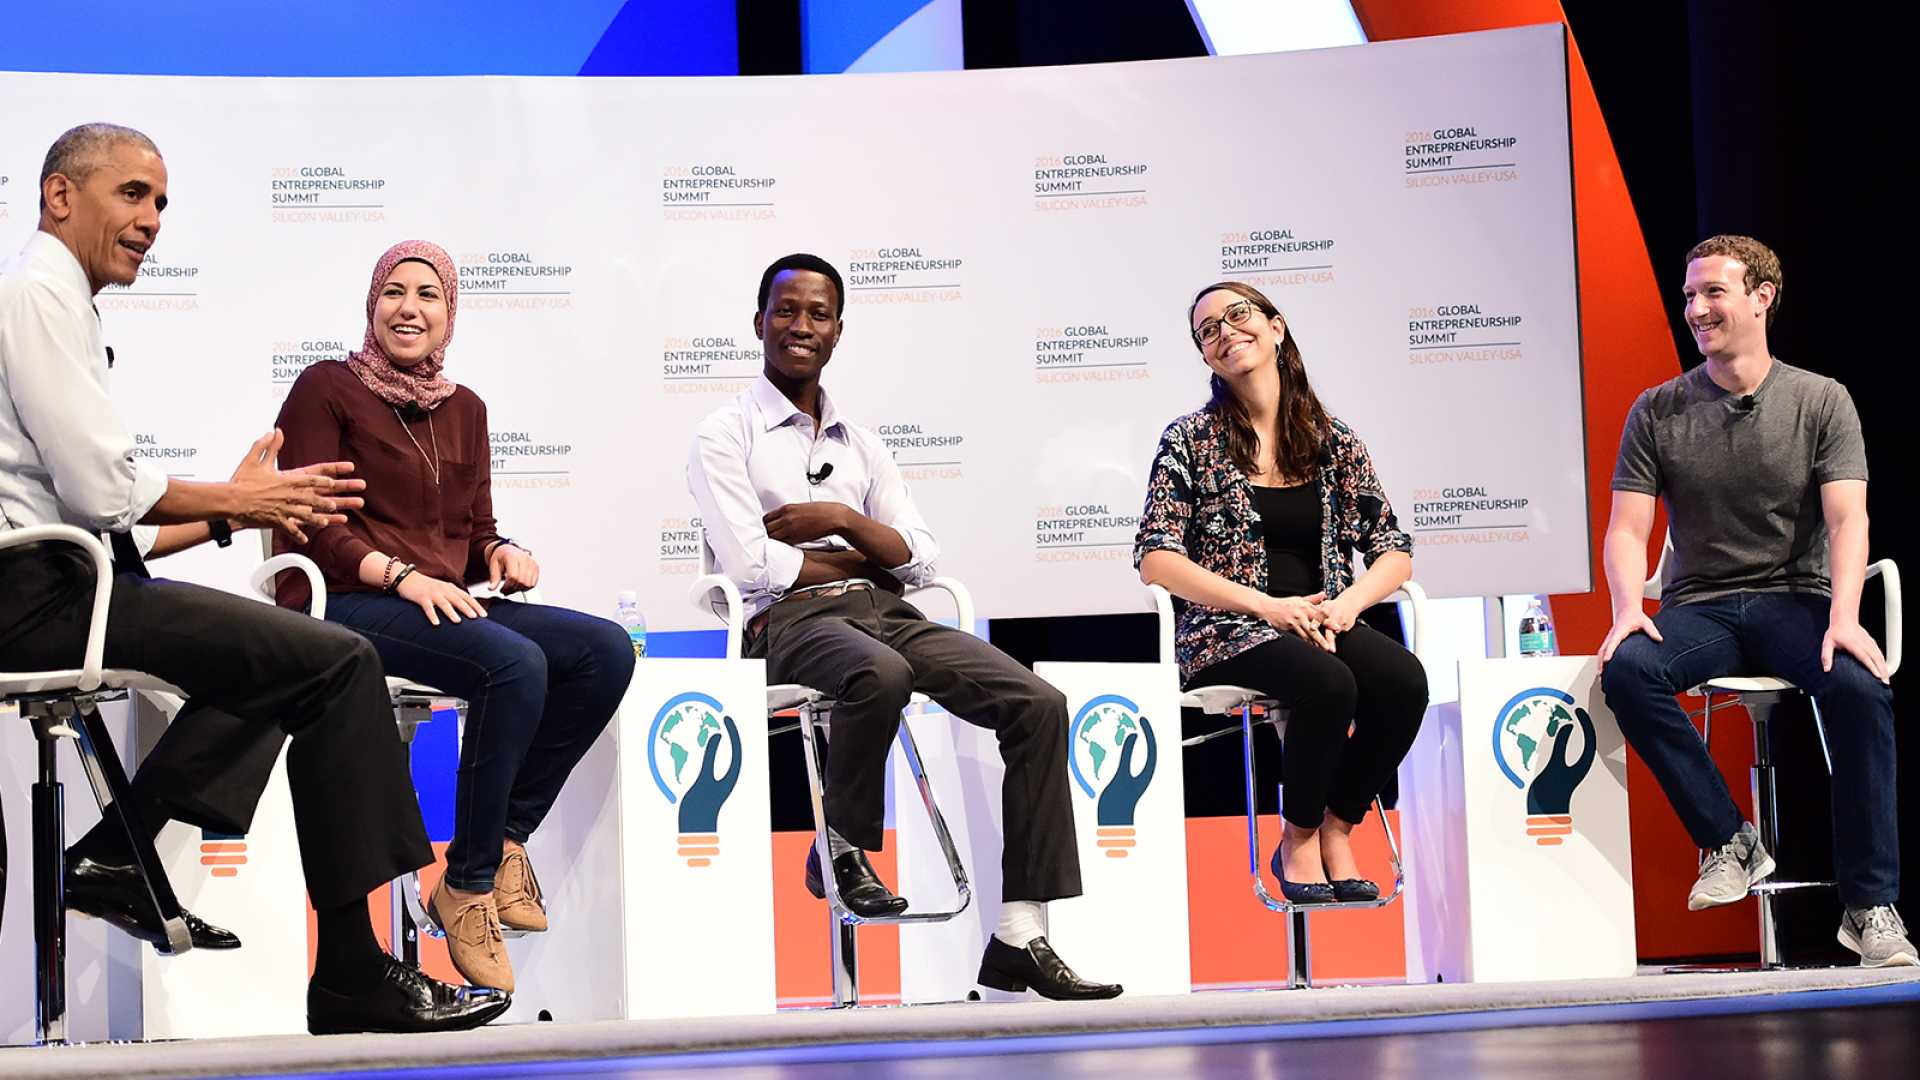 5 Takeaways From the Global Entrepreneurship Summit